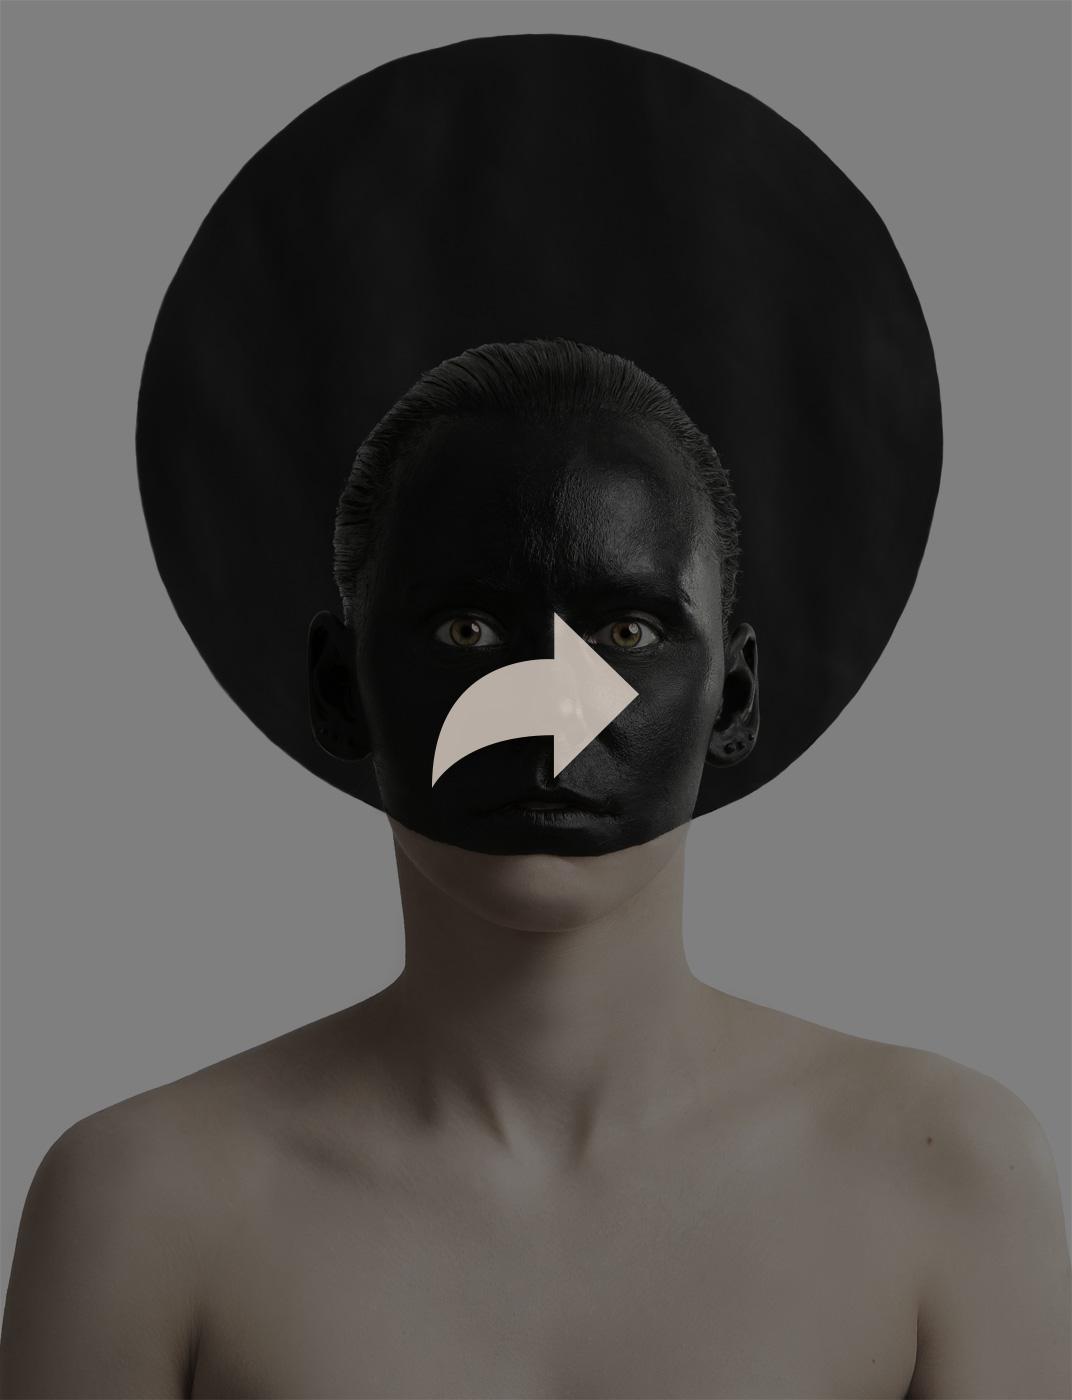 Black Circle, Kazimir Malevich, suprematism, triptych, Black Square, Black Circle, Black Cross, Model, Varvara Agapova, Painting, Eugenia Sorokina, Idea, photography, Ivan Bessedin, art, studio, minimalism, fashion